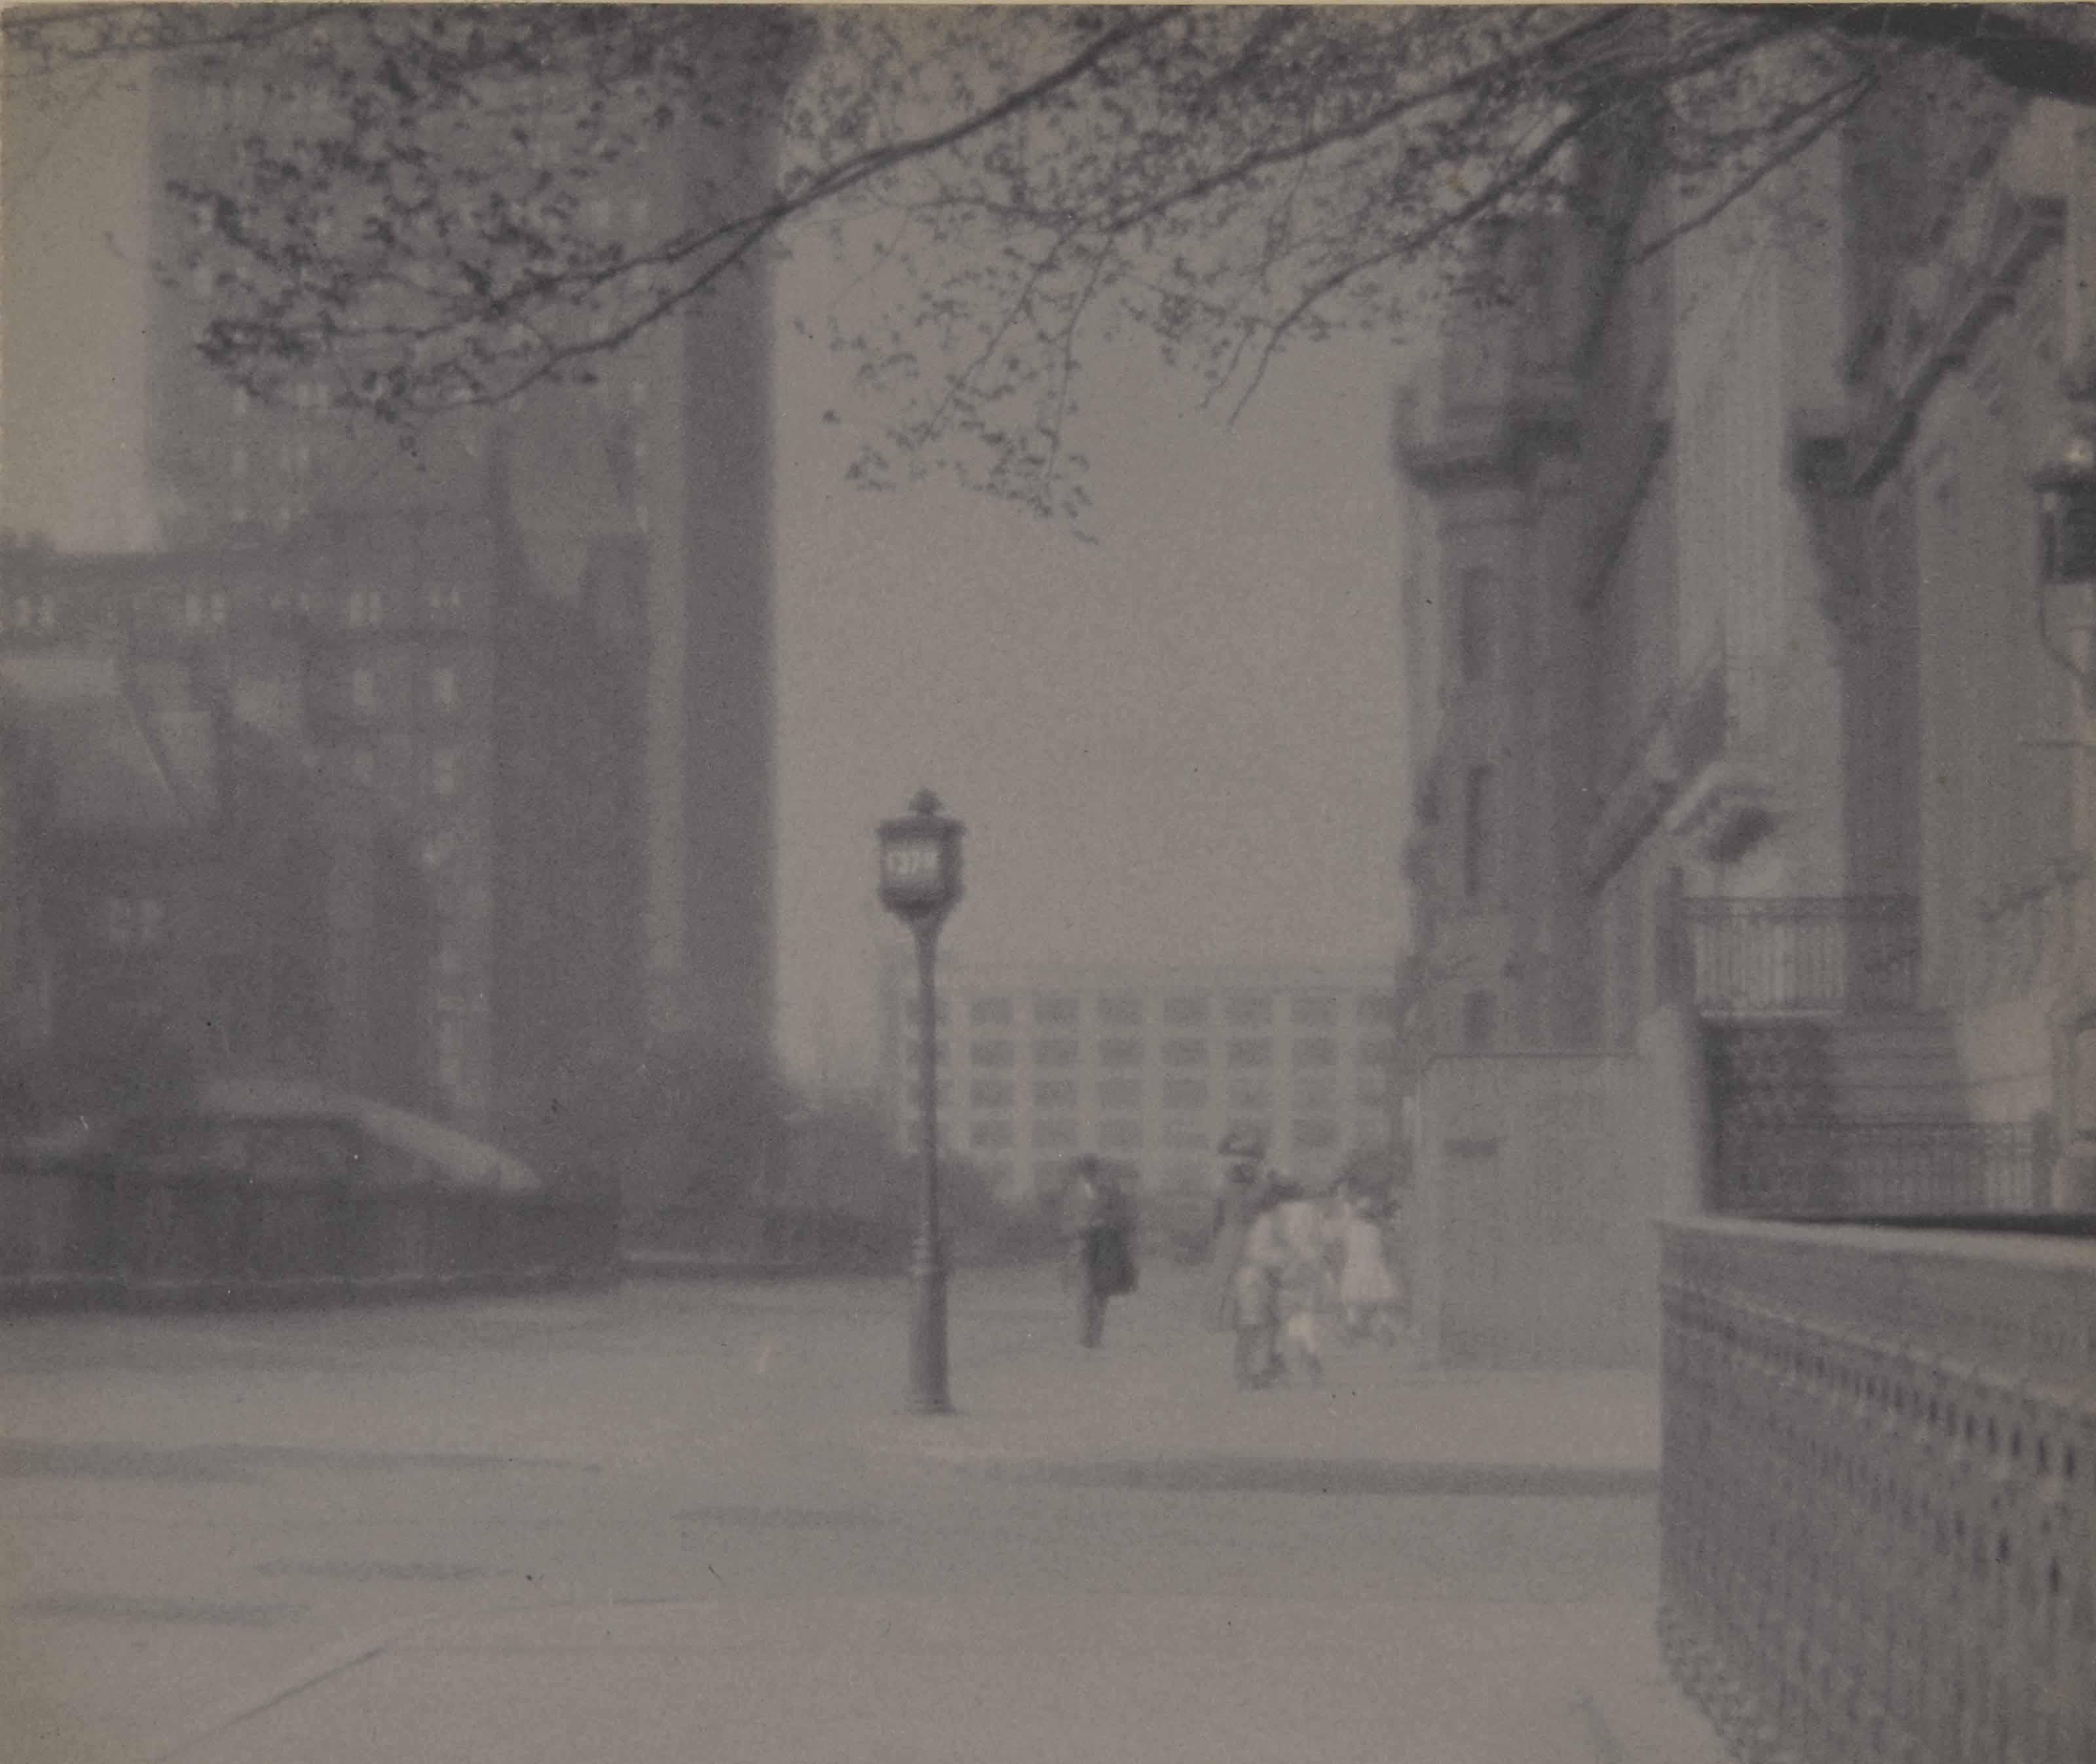 37th Street, New York, 1911